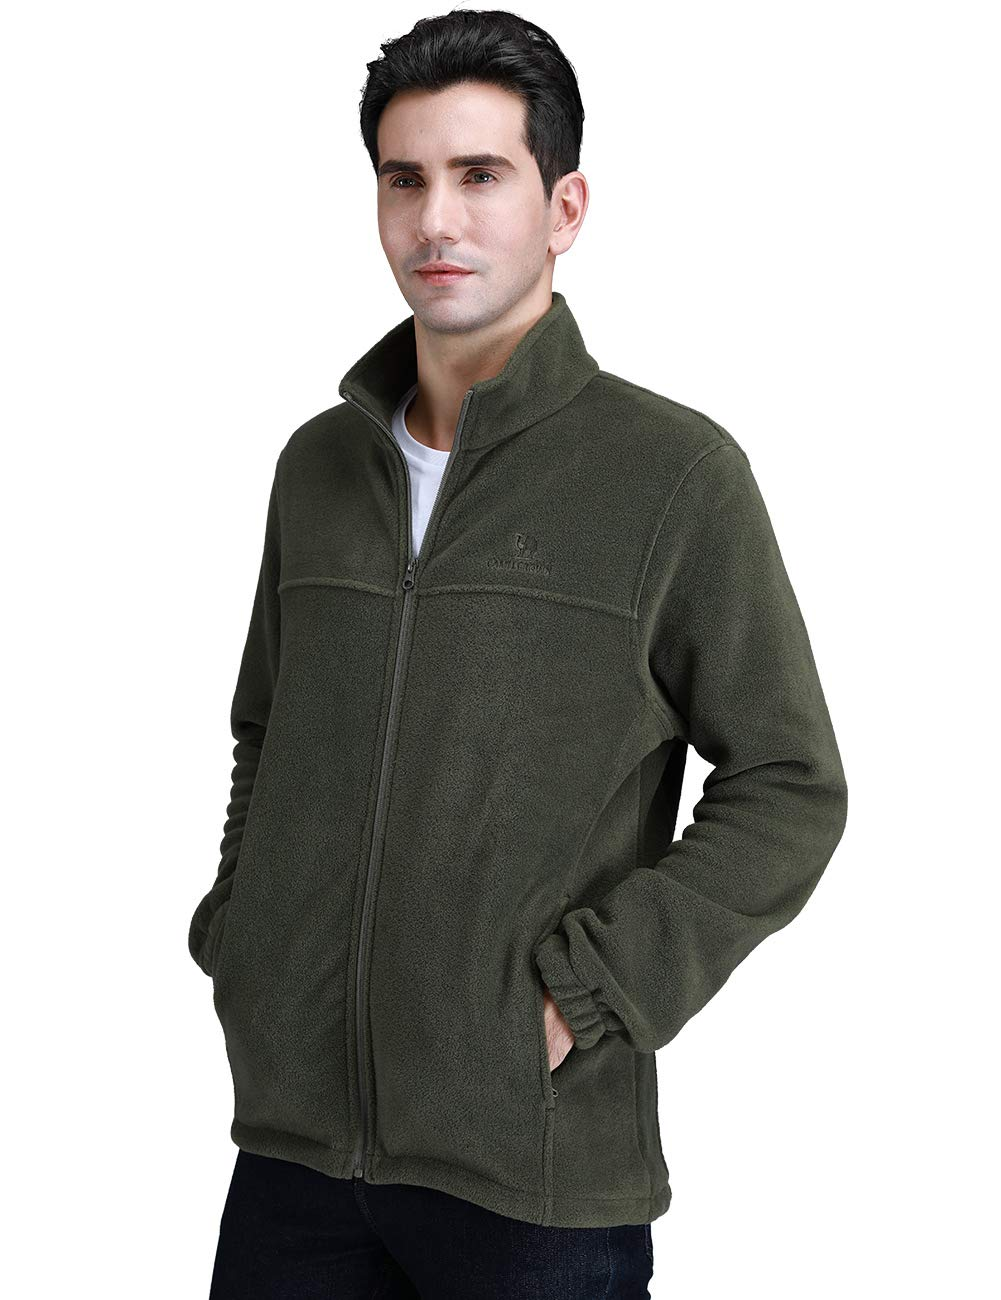 DailyWear Mens Full-Zip Polar Fleece Jacket